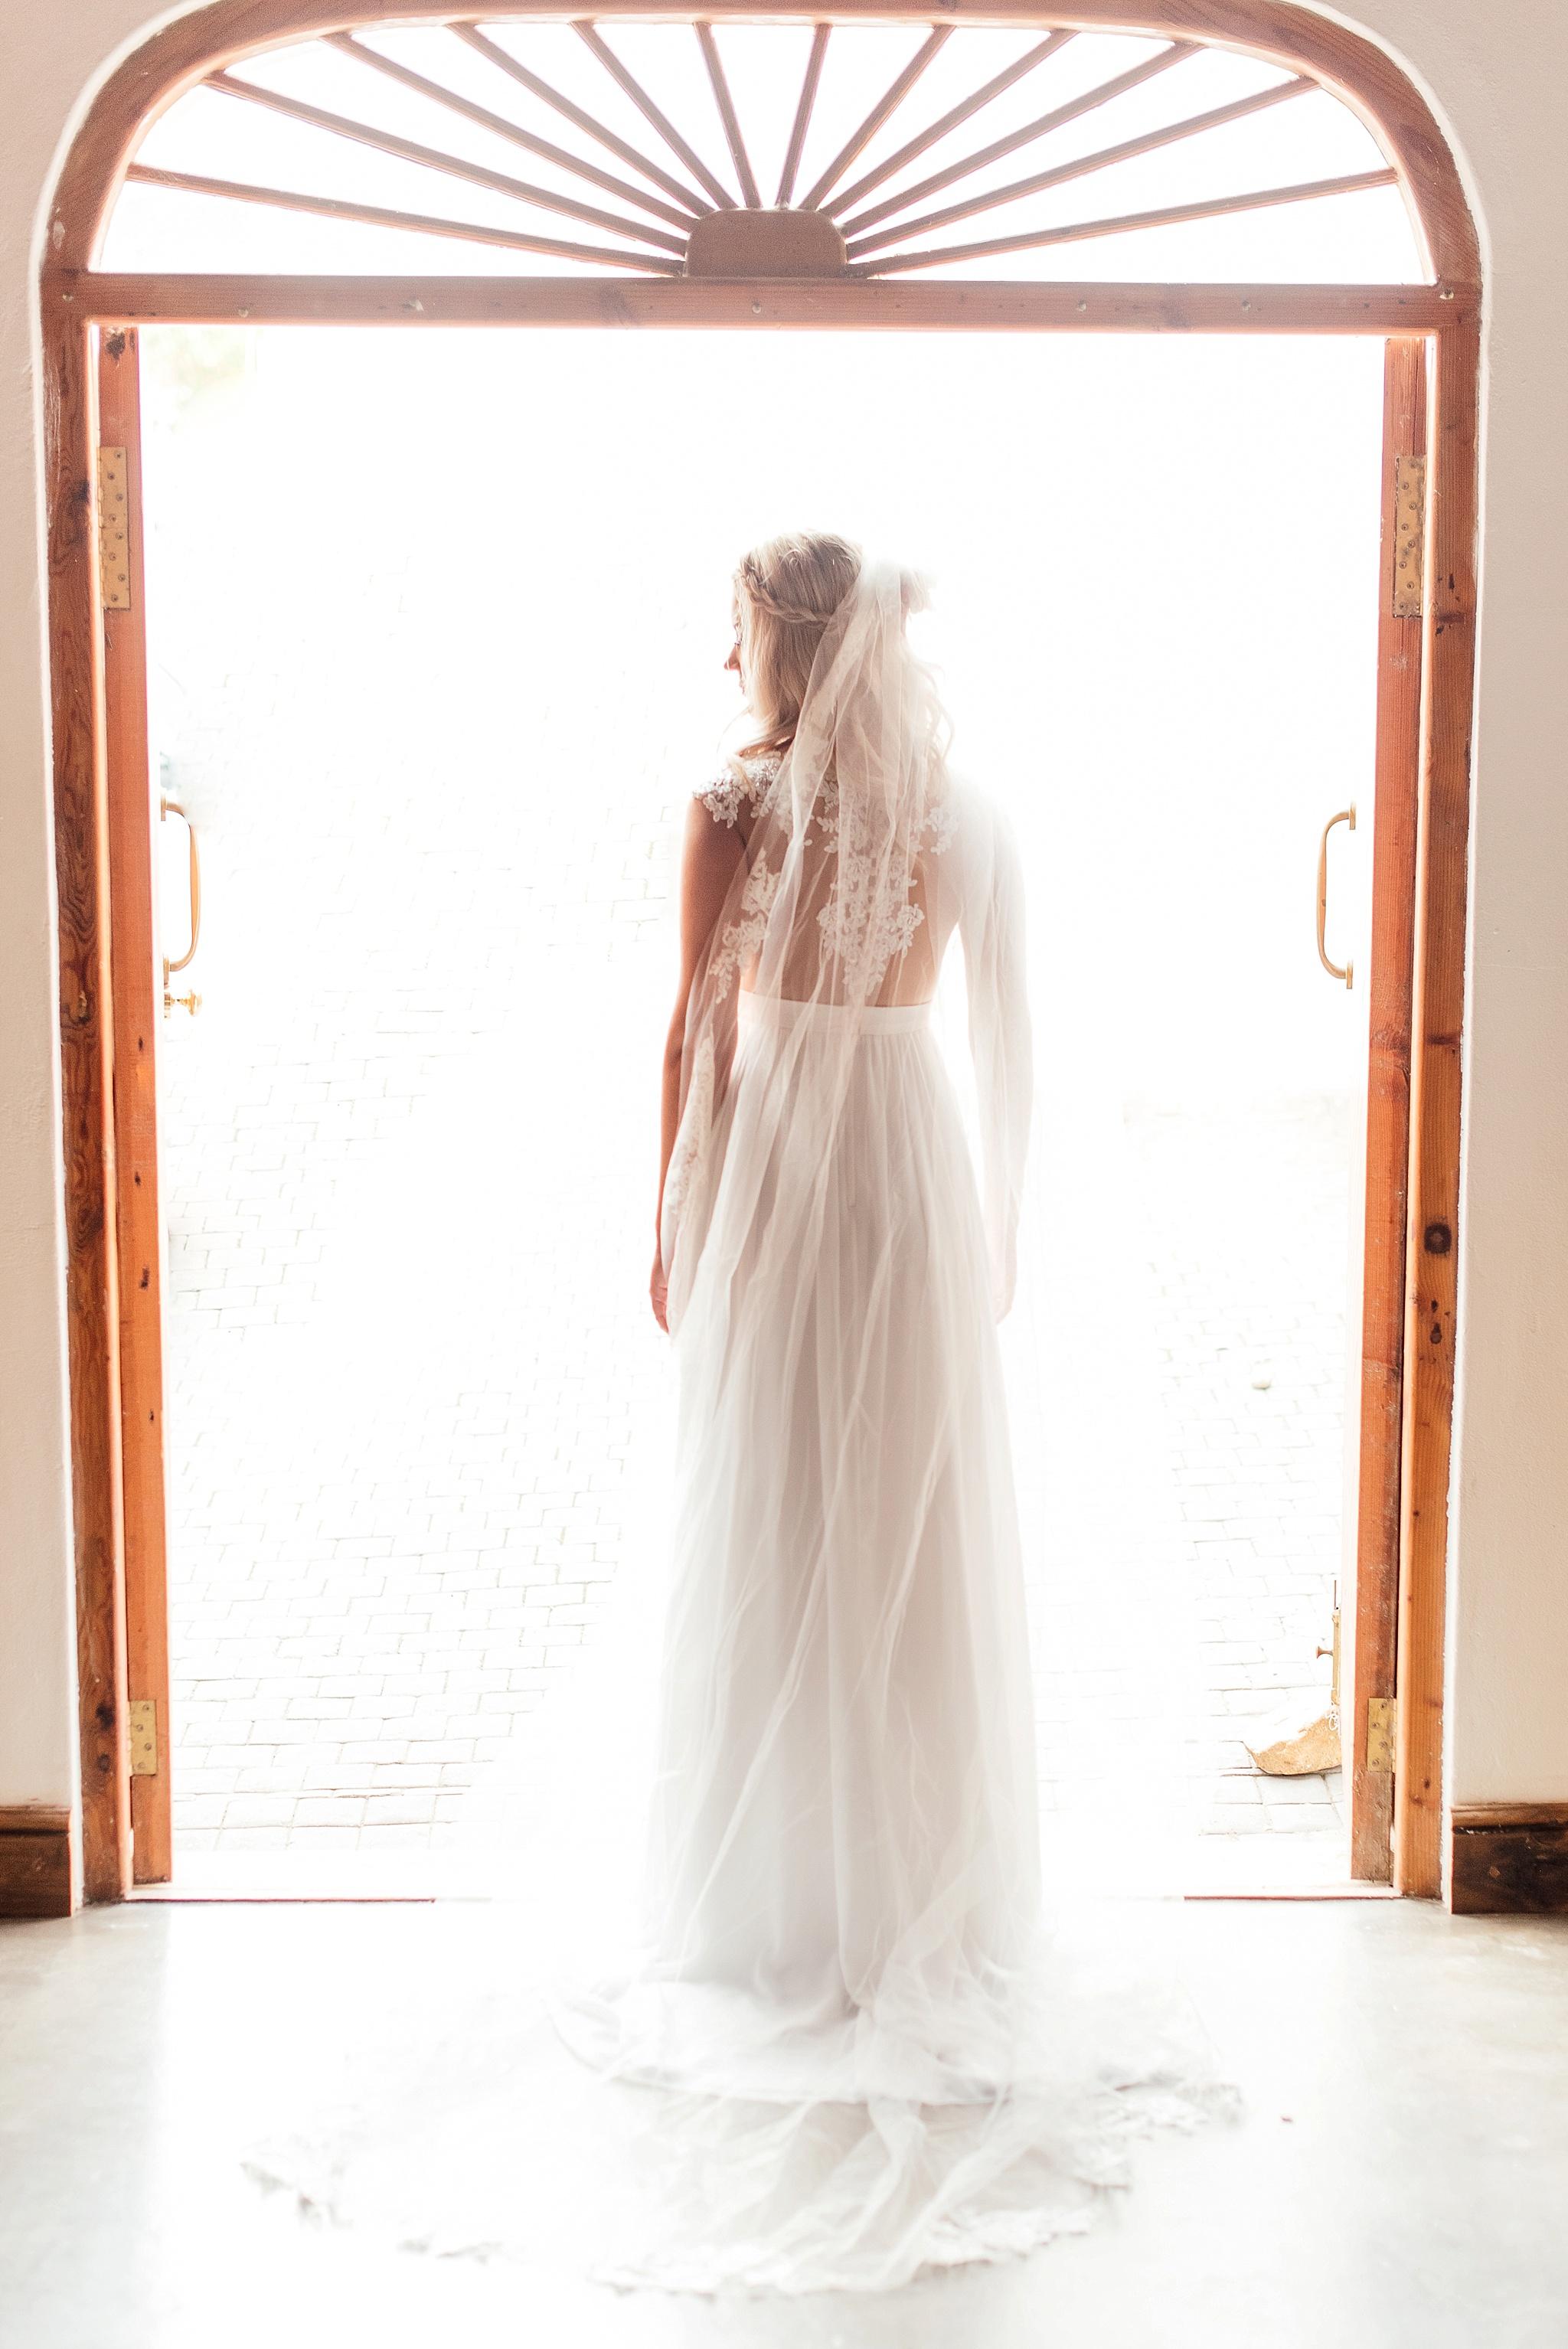 Cape Town Photographer Darren Bester - Die Woud Wedding - Gareth & Roxanne_0068.jpg